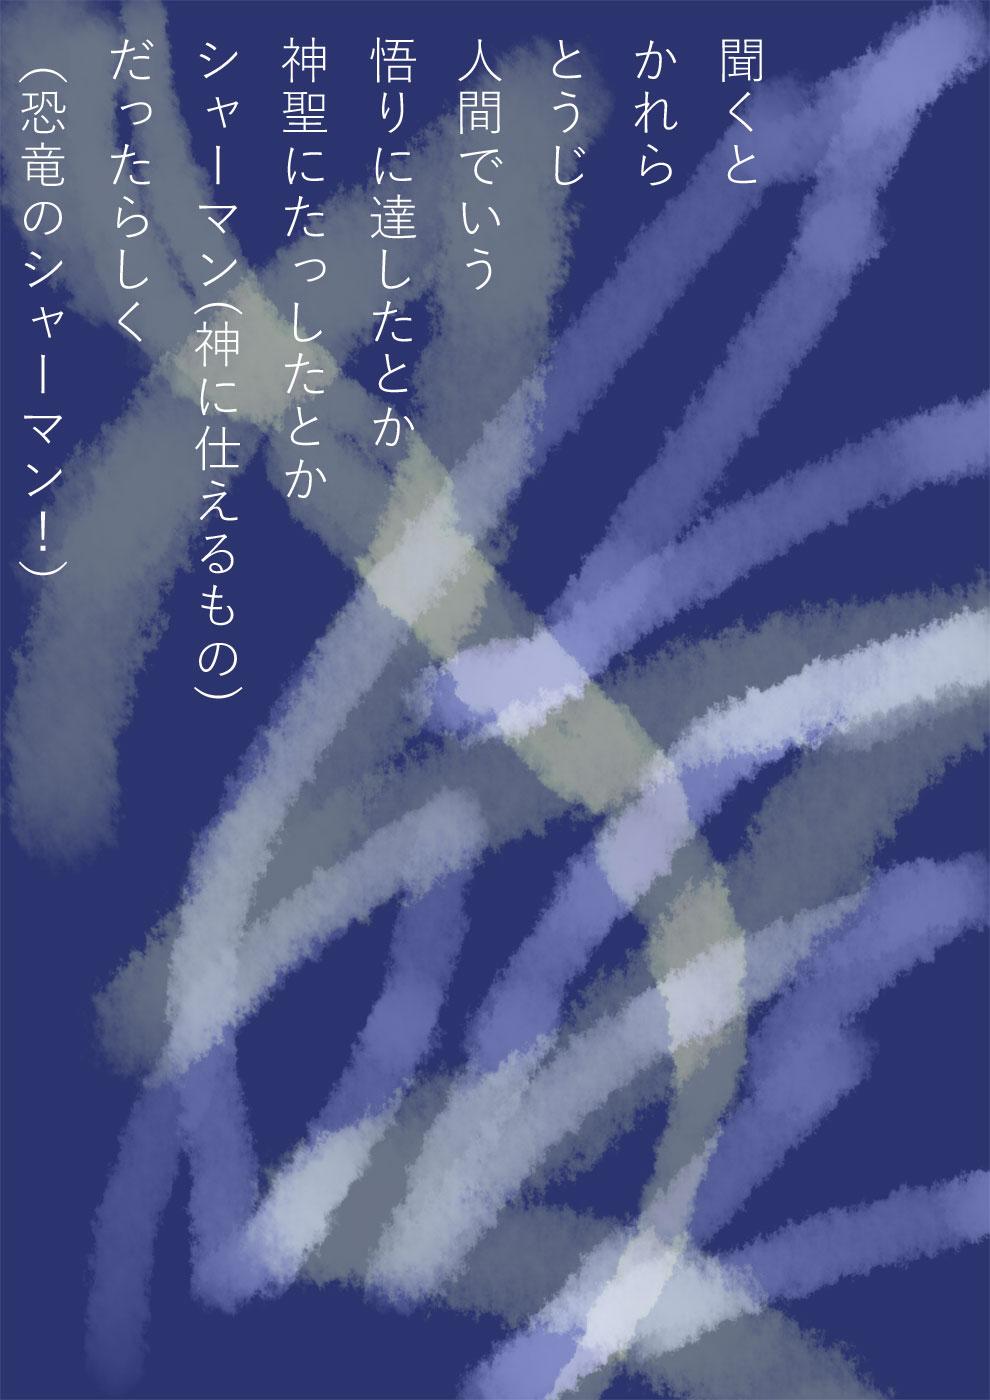 http://ahito.com/comic/ehon/kamiuta/img/2018/20180505_2/03.jpg